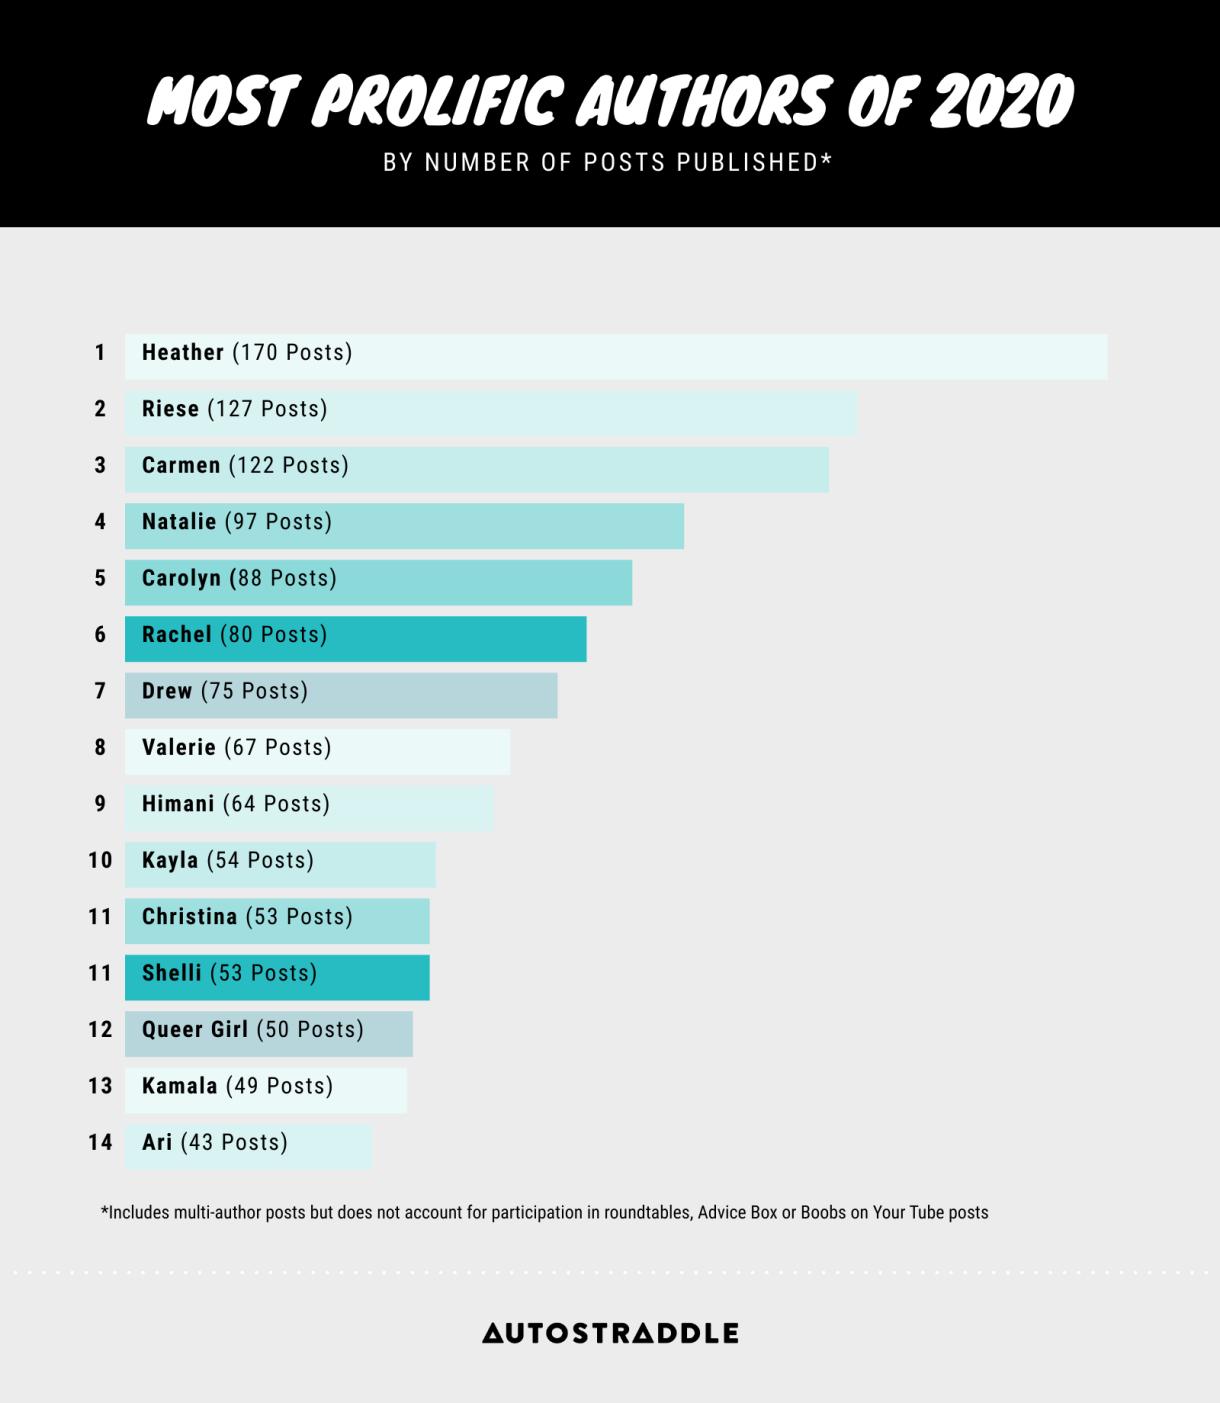 Most Prolific Authors of 2020: 1. Heather - 170, 2. Riese - 127, 3. Carmen - 122, 4. Natalie - 97, 5. Carolyn - 88, 6. Rachel - 80, 7. Drew - 75, 8. Valerie - 67, 9. Himani - 64, 10. Kayla - 54, 11. Christina - 53, 11. Shelli - 53, 12. Queer Girl - 50, 13. Kamala - 49, 14. Ari - 43